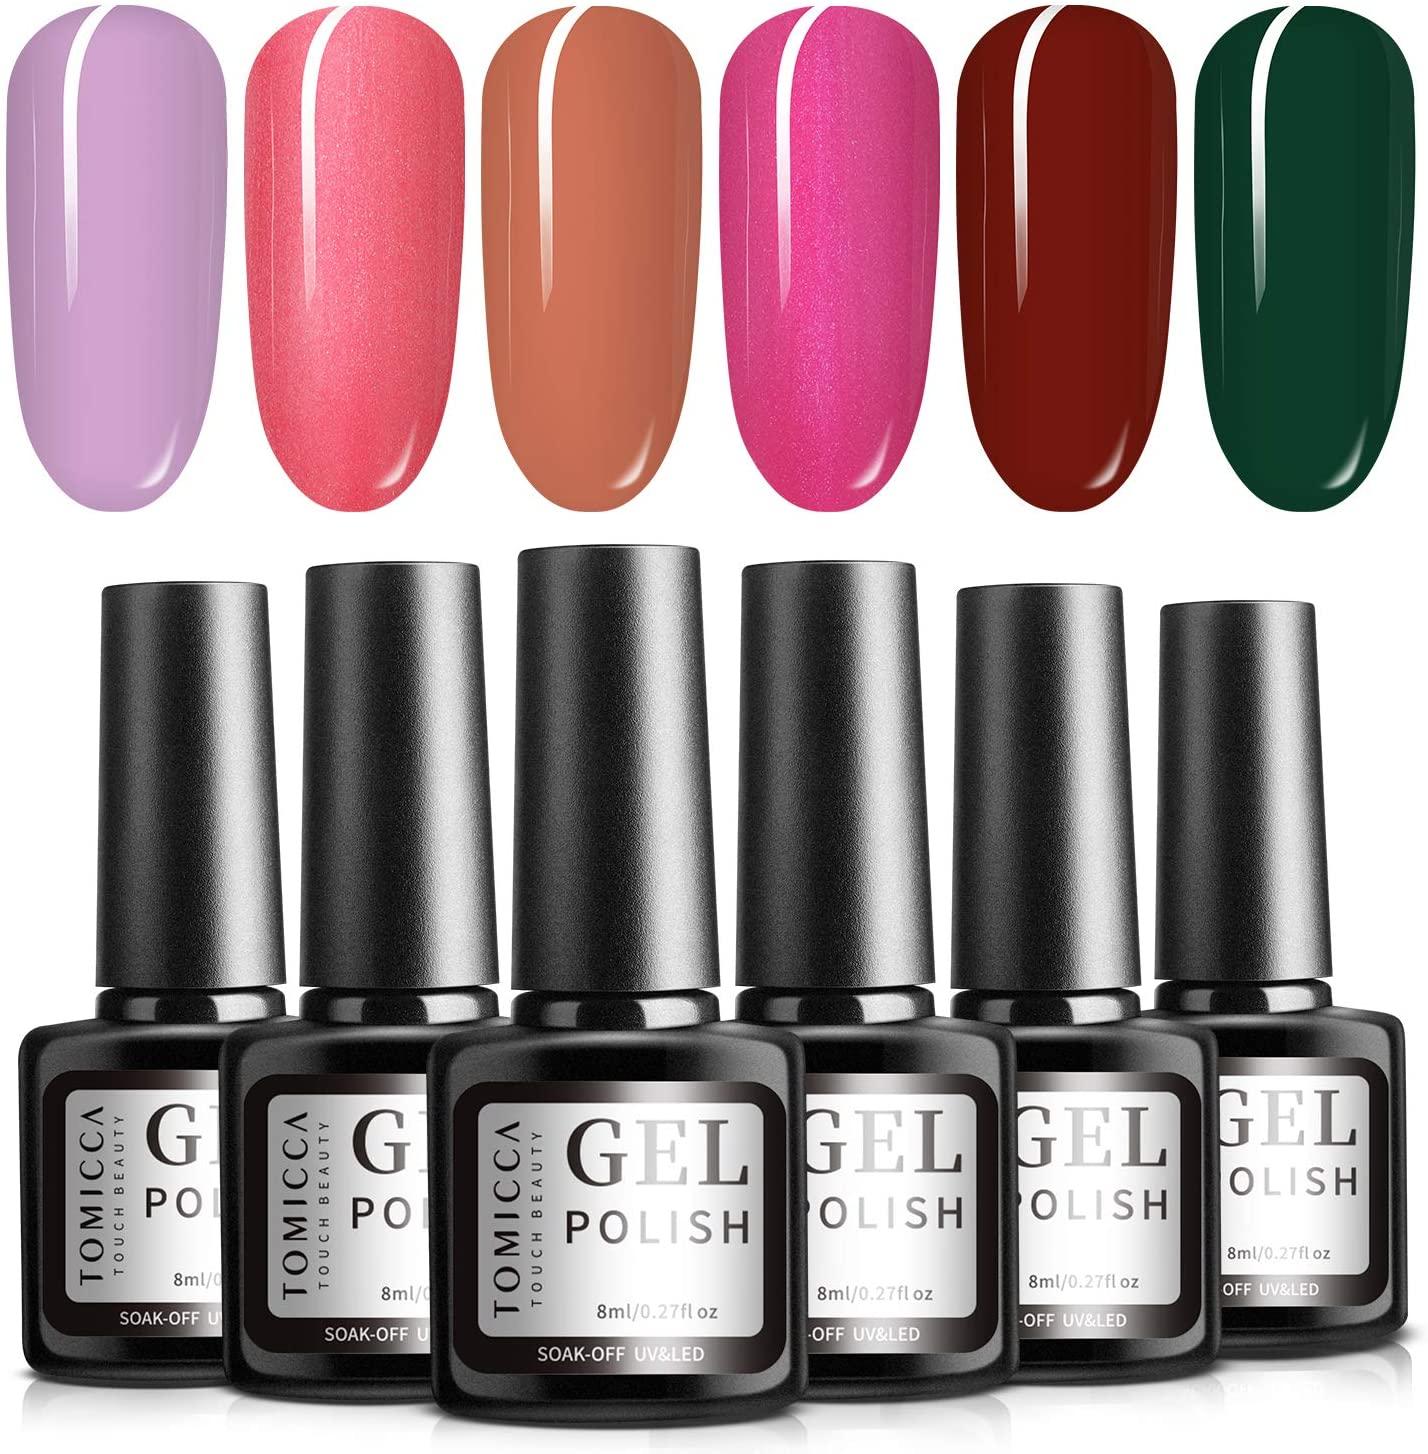 TOMICCA Gel Nail Polish Set, Pink Red Green, 6 Fall Autumn Color Gel, Soak Off Gel Polish Starter Kit, UV LED Gel Manicure for Home & Salon, No Chip, Non Toxic - 6 × 8ml